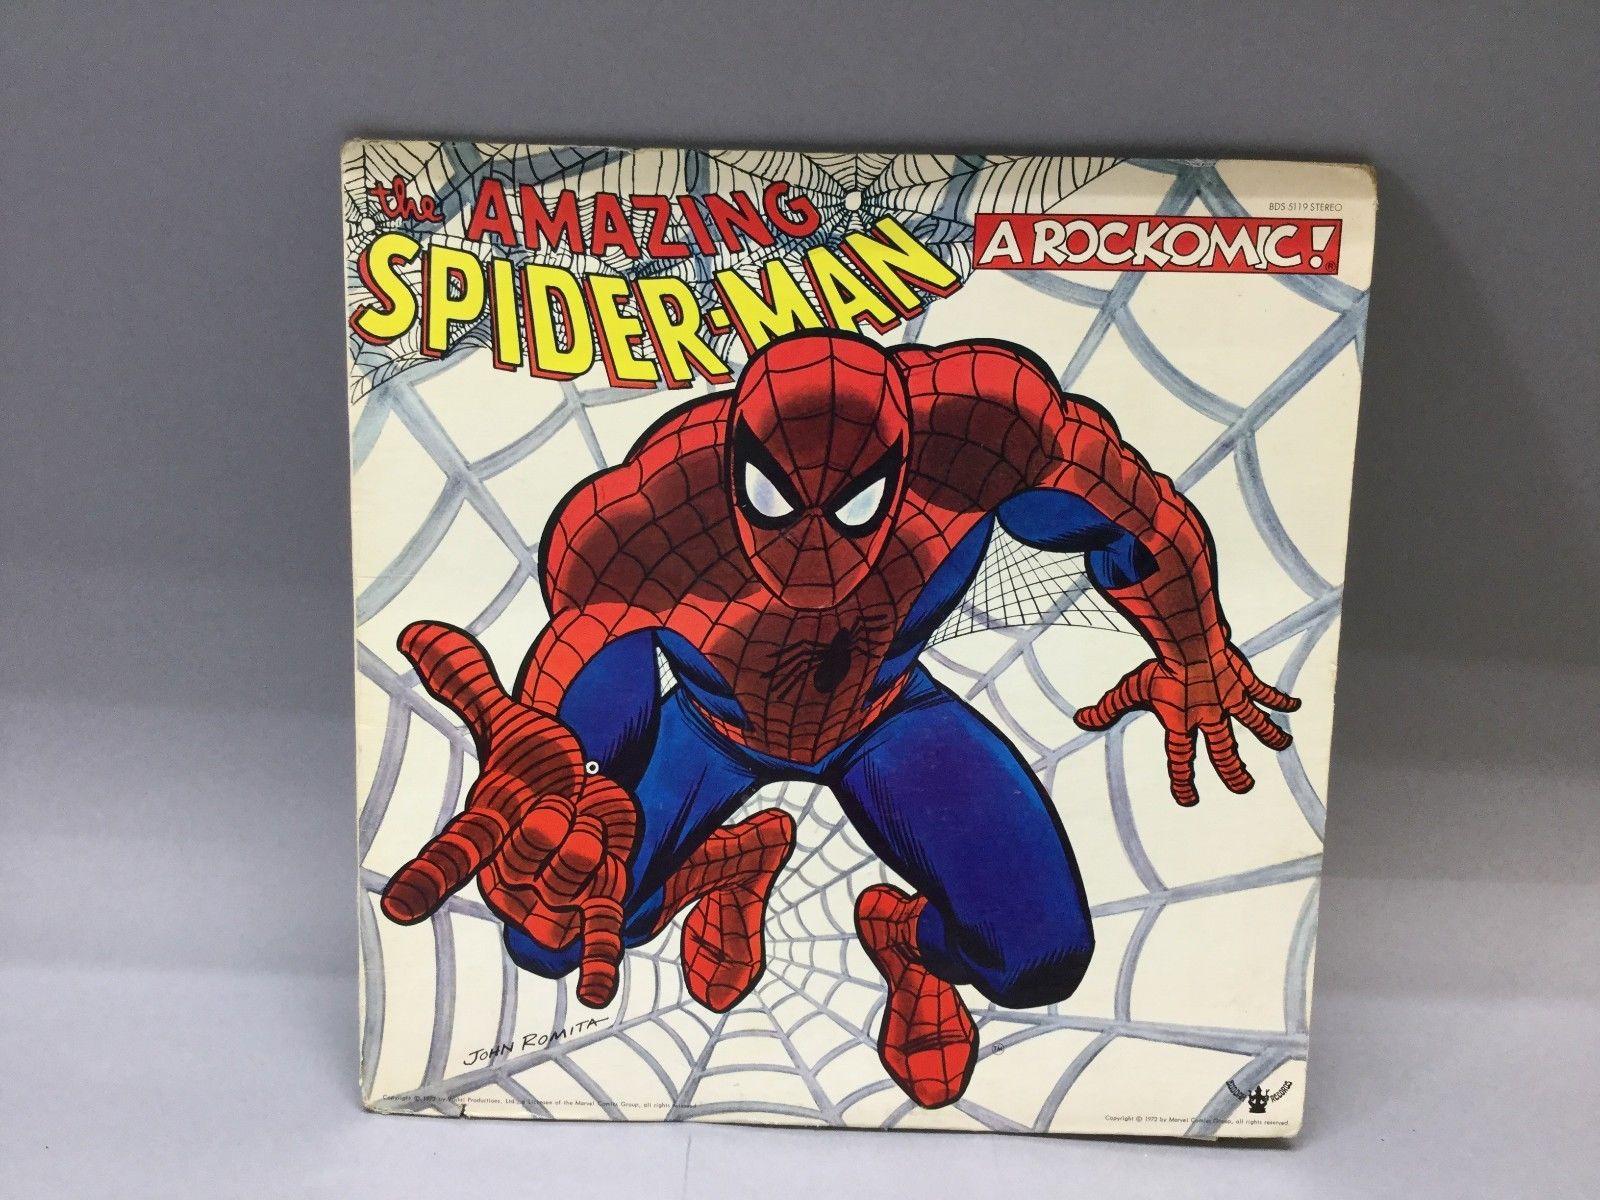 1972 Buddah Record - The Amazing Spiderman A Rockomic